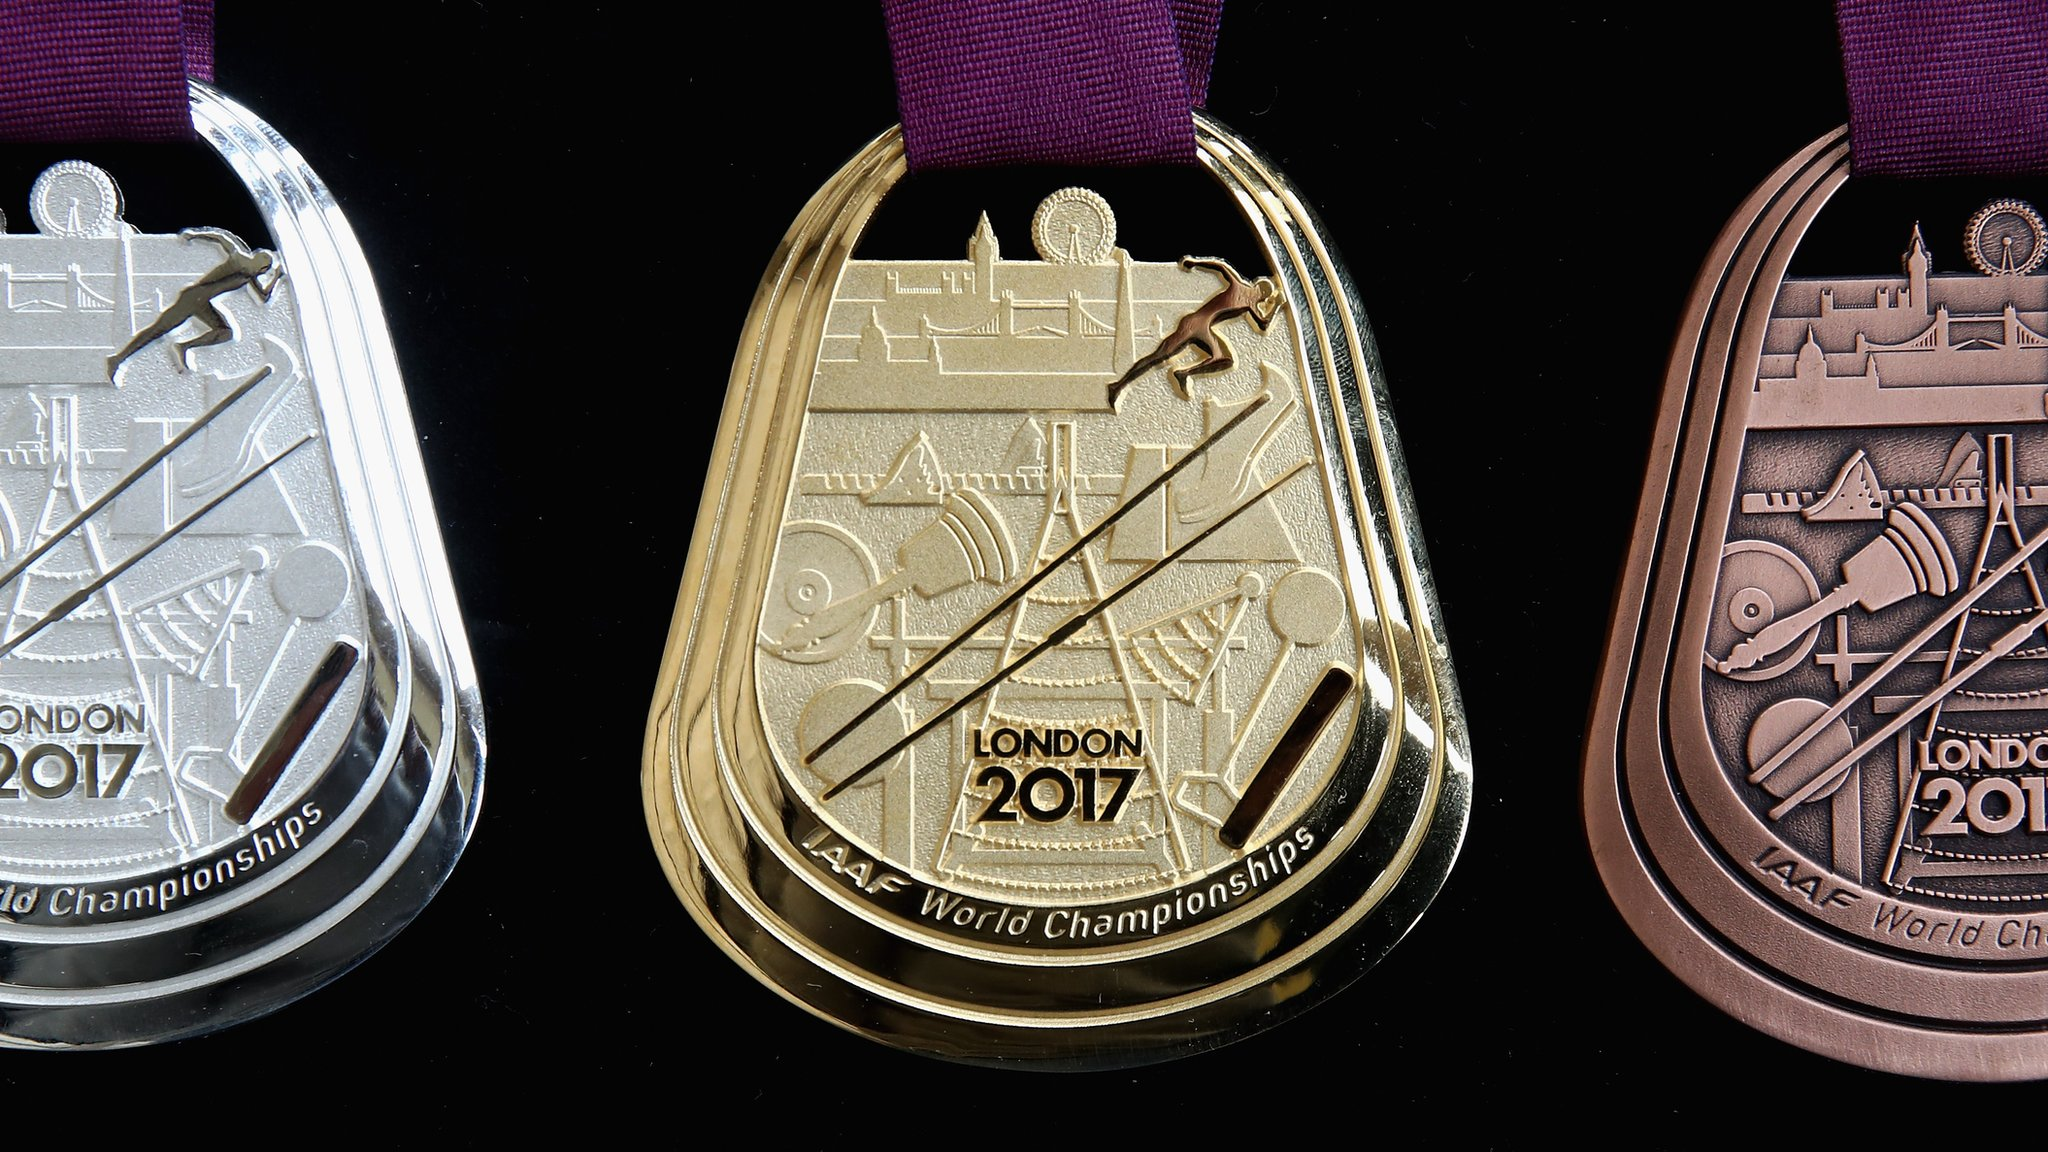 World Athletics Championships: London 2017 medals revealed